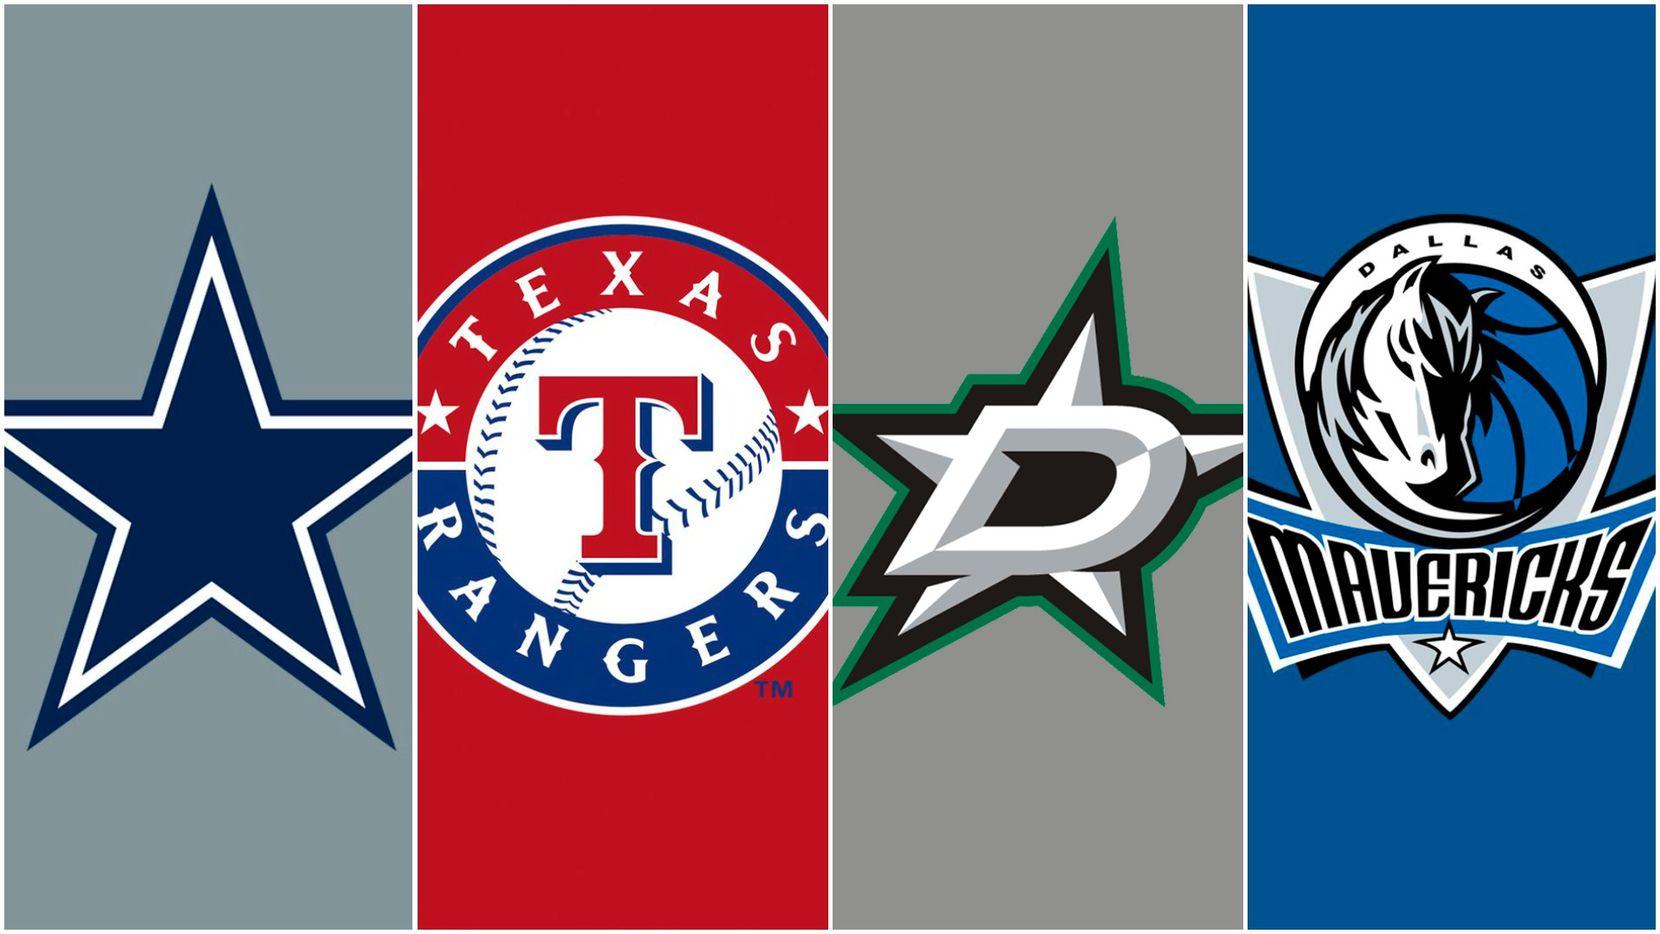 The logos for the Dallas Cowboys, Texas Rangers, Dallas Stars and Dallas Mavericks.